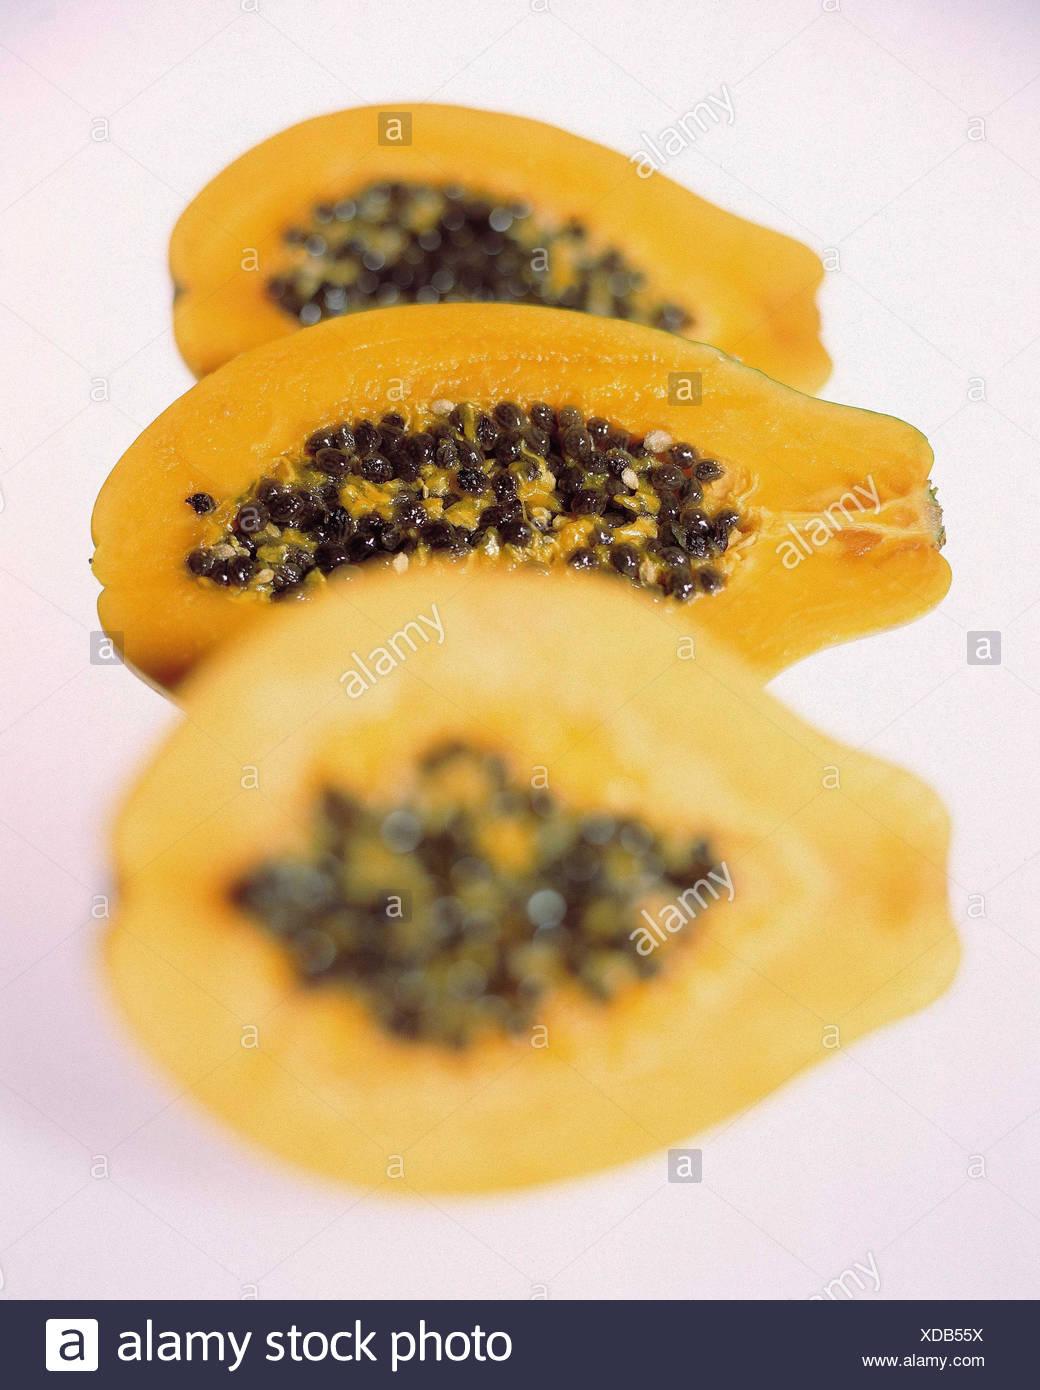 Papayas Divides Still Life Food Eat Fruit Fruits Berries